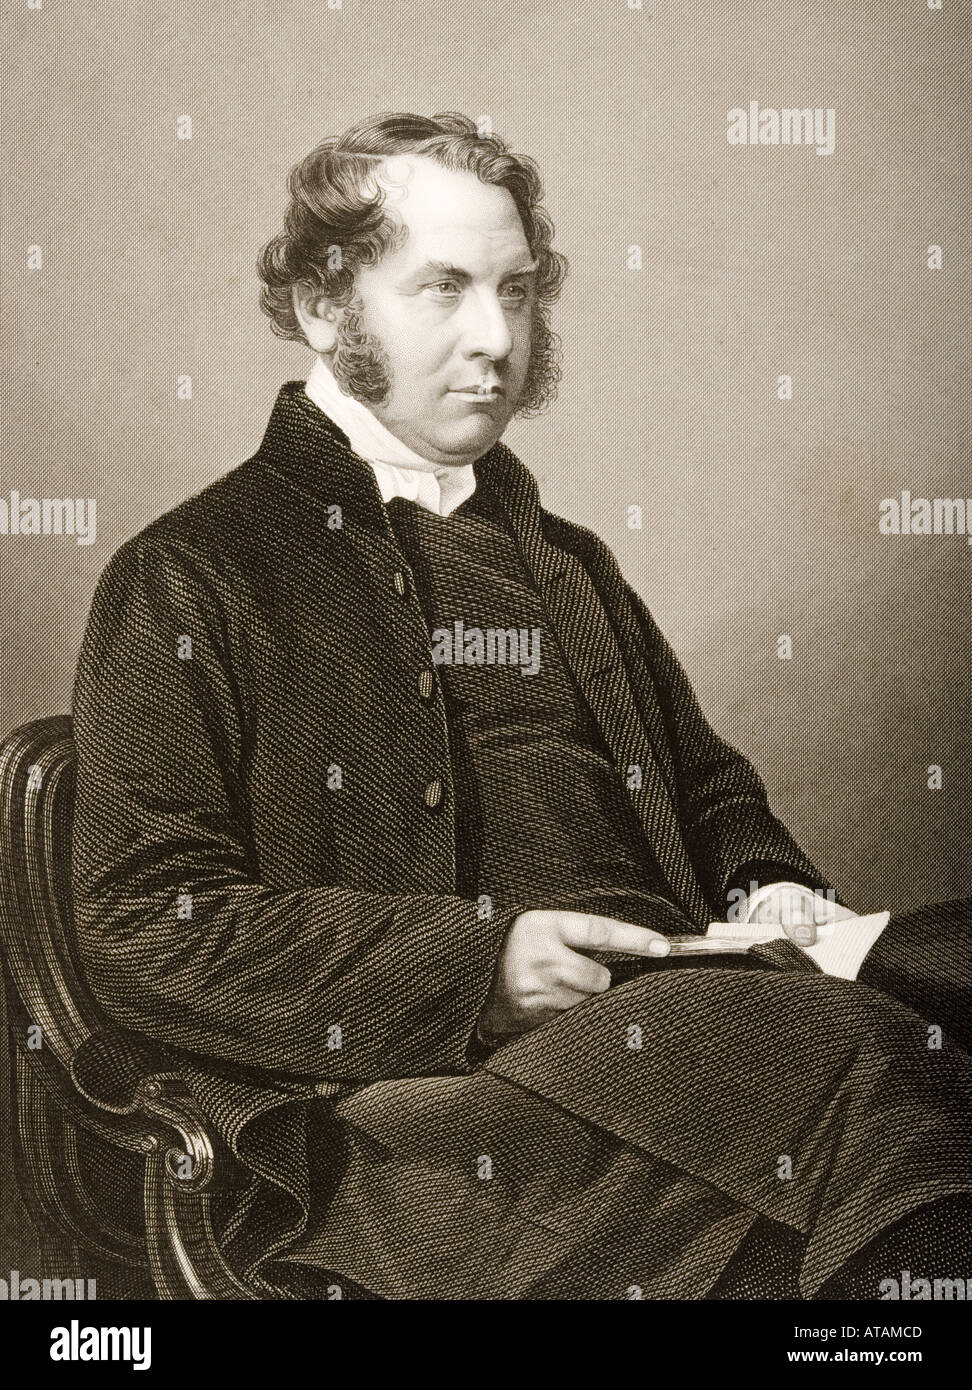 Henry Montagu Villiers Lord Bishop of Carlisle 1813 1861 - Stock Image